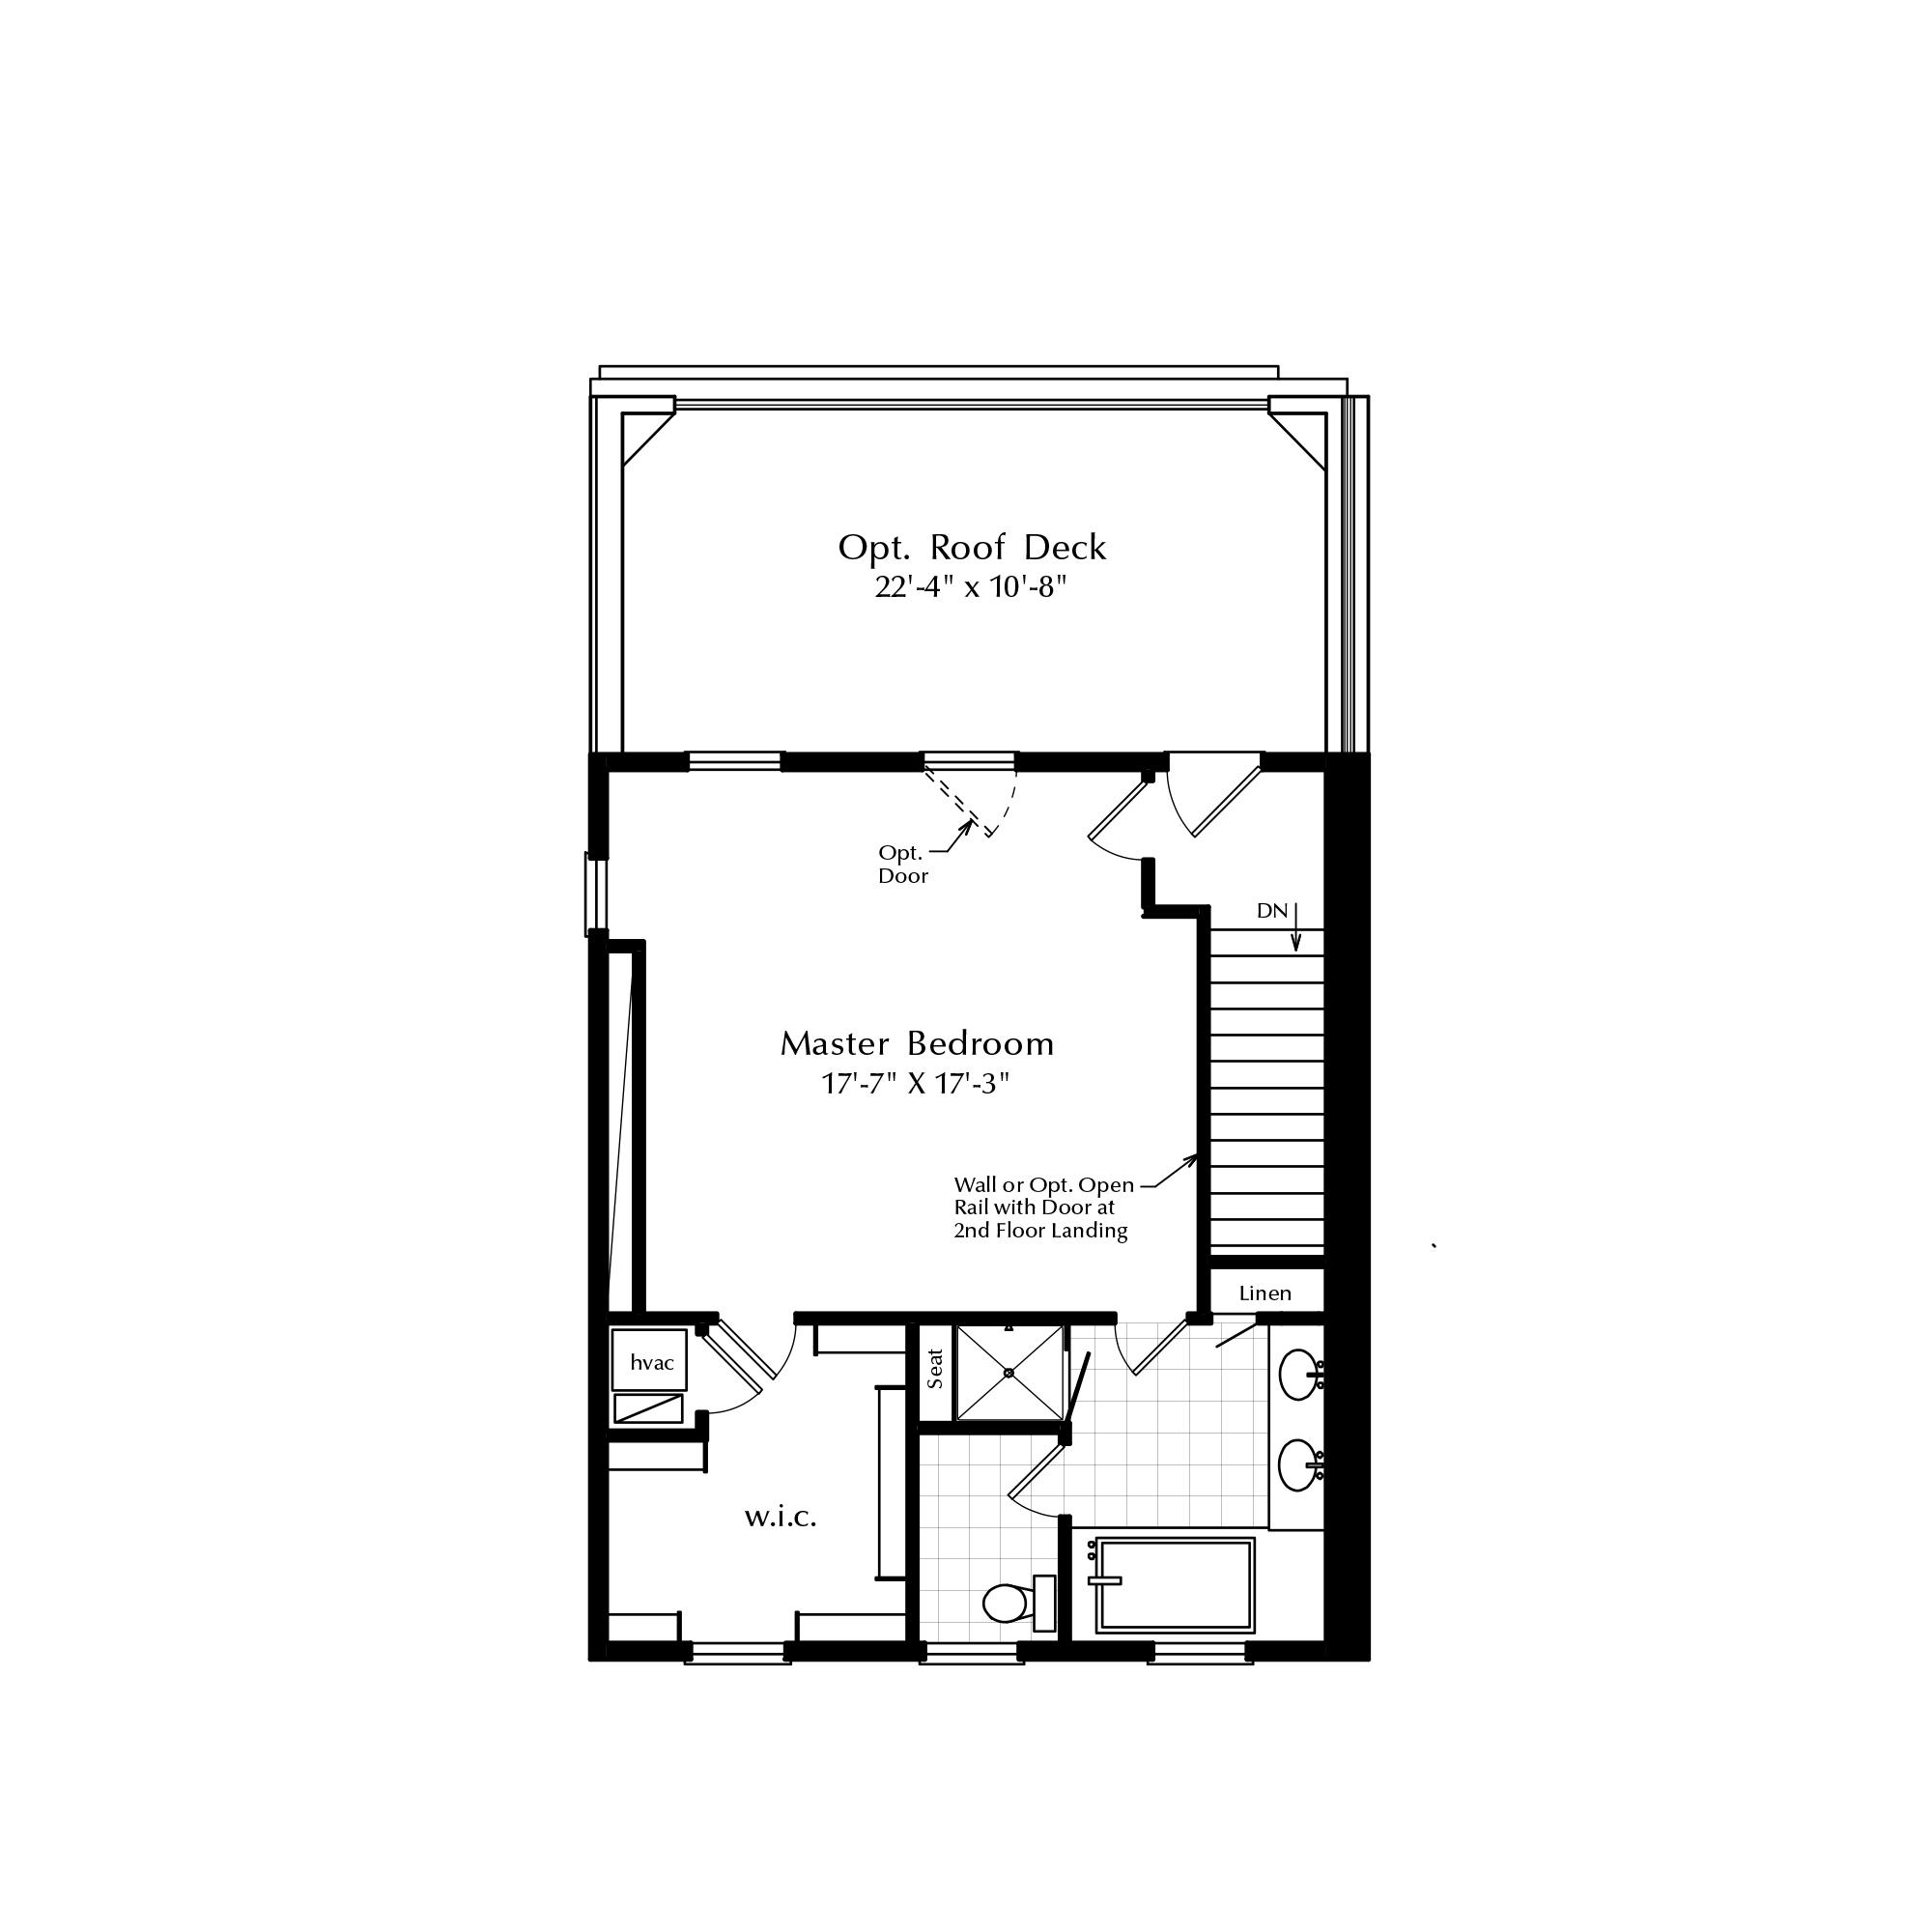 Alternative Third Floor with Master Suite Option